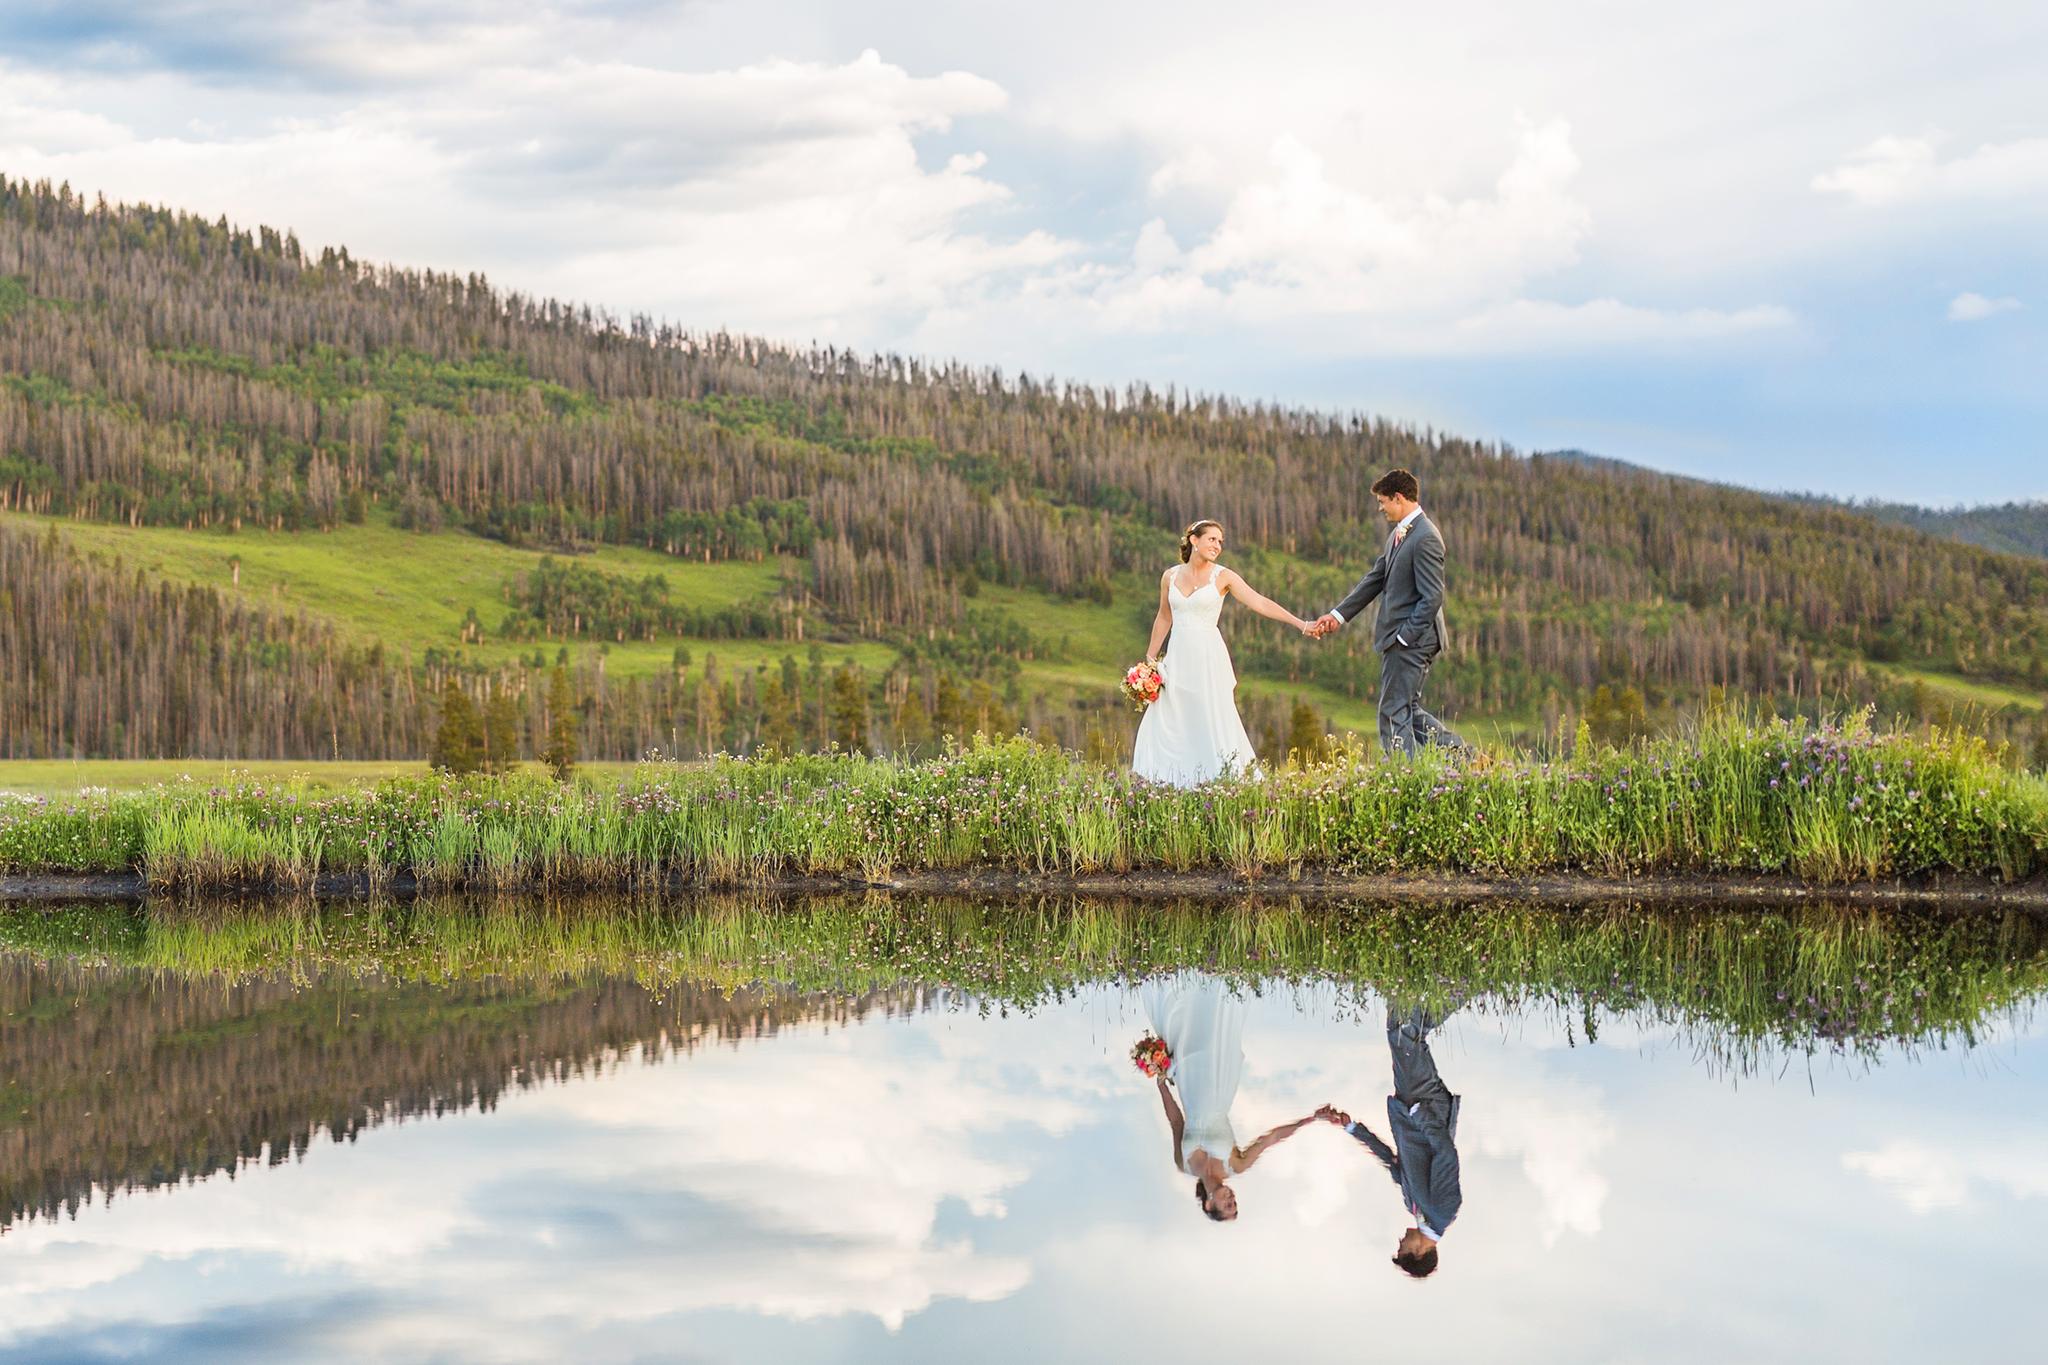 Colorado Rocky Mountain Wedding Photography by: Ashley McKenzie Photography